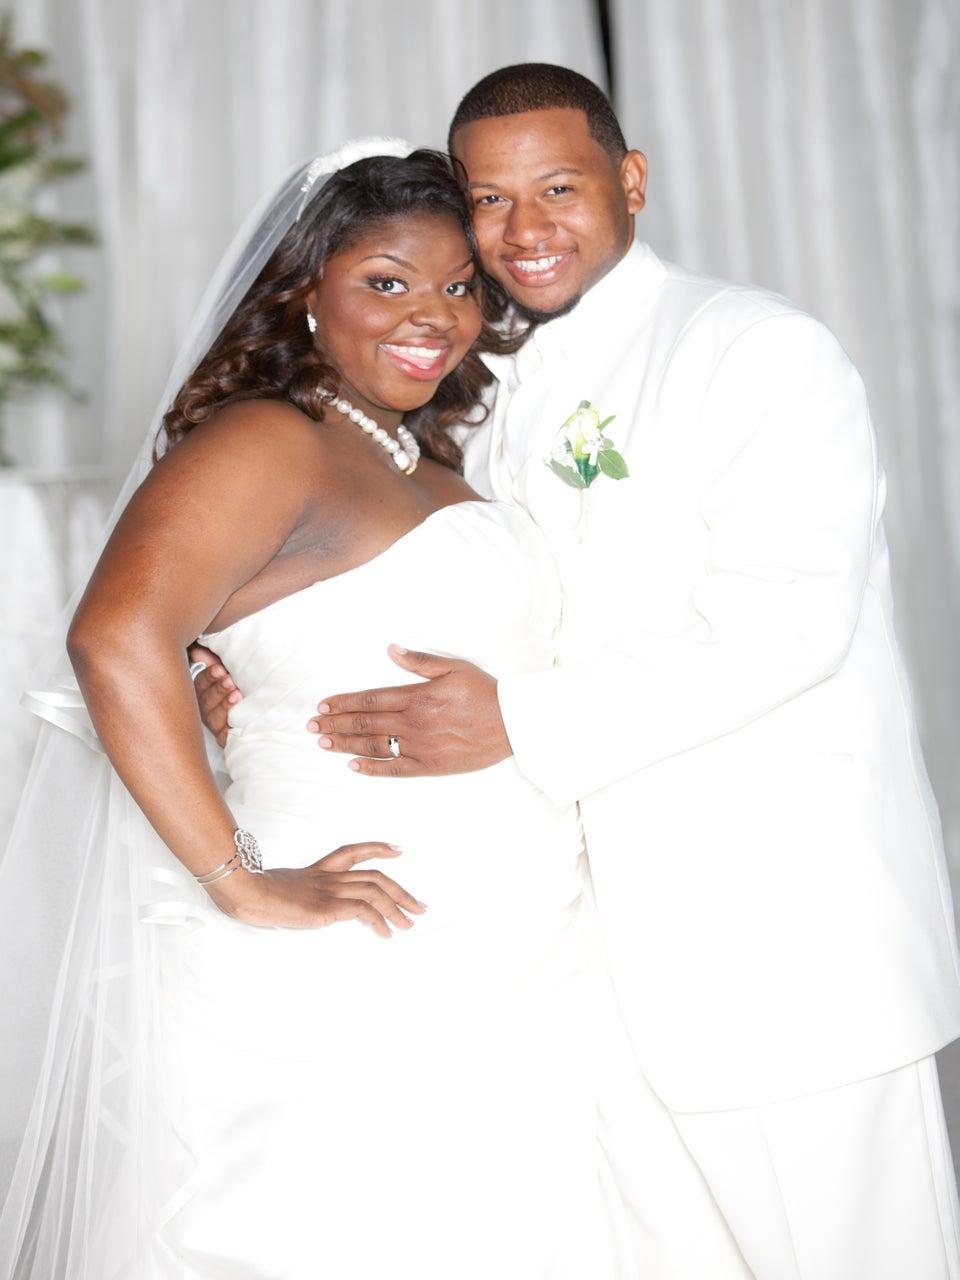 Exclusive: Bishop T.D. Jakes' Daughter Gets Married